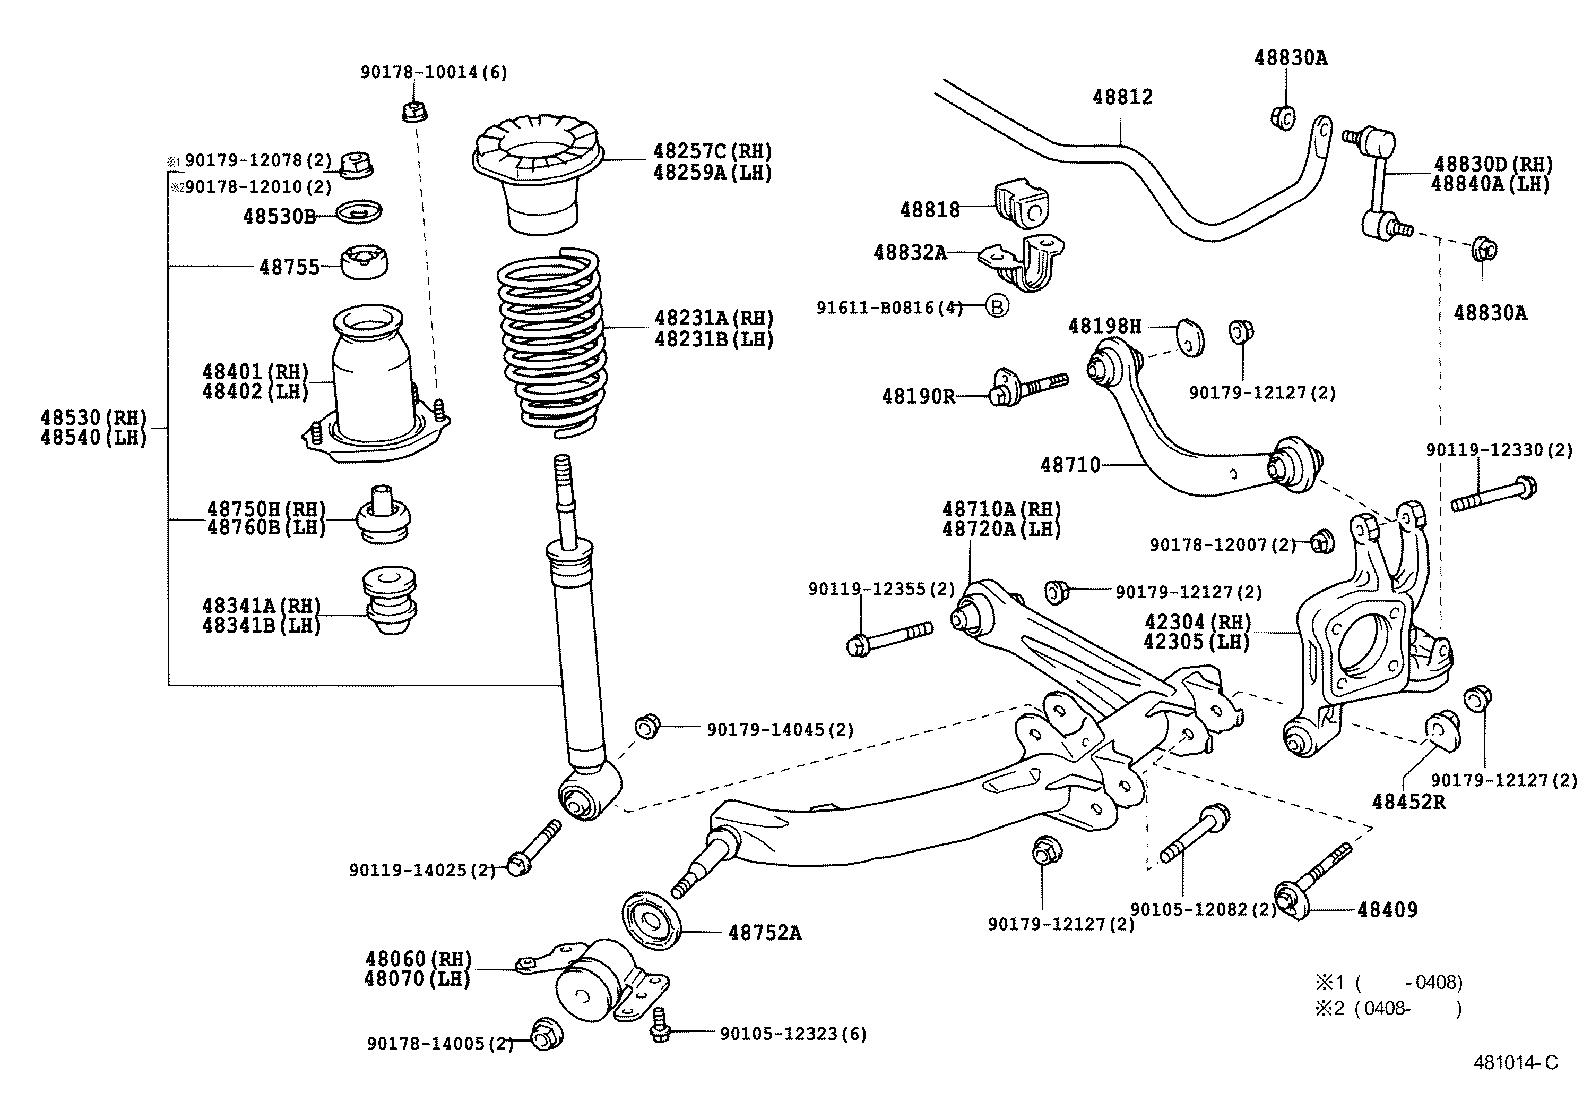 1999 toyota land cruiser fuse box diagram